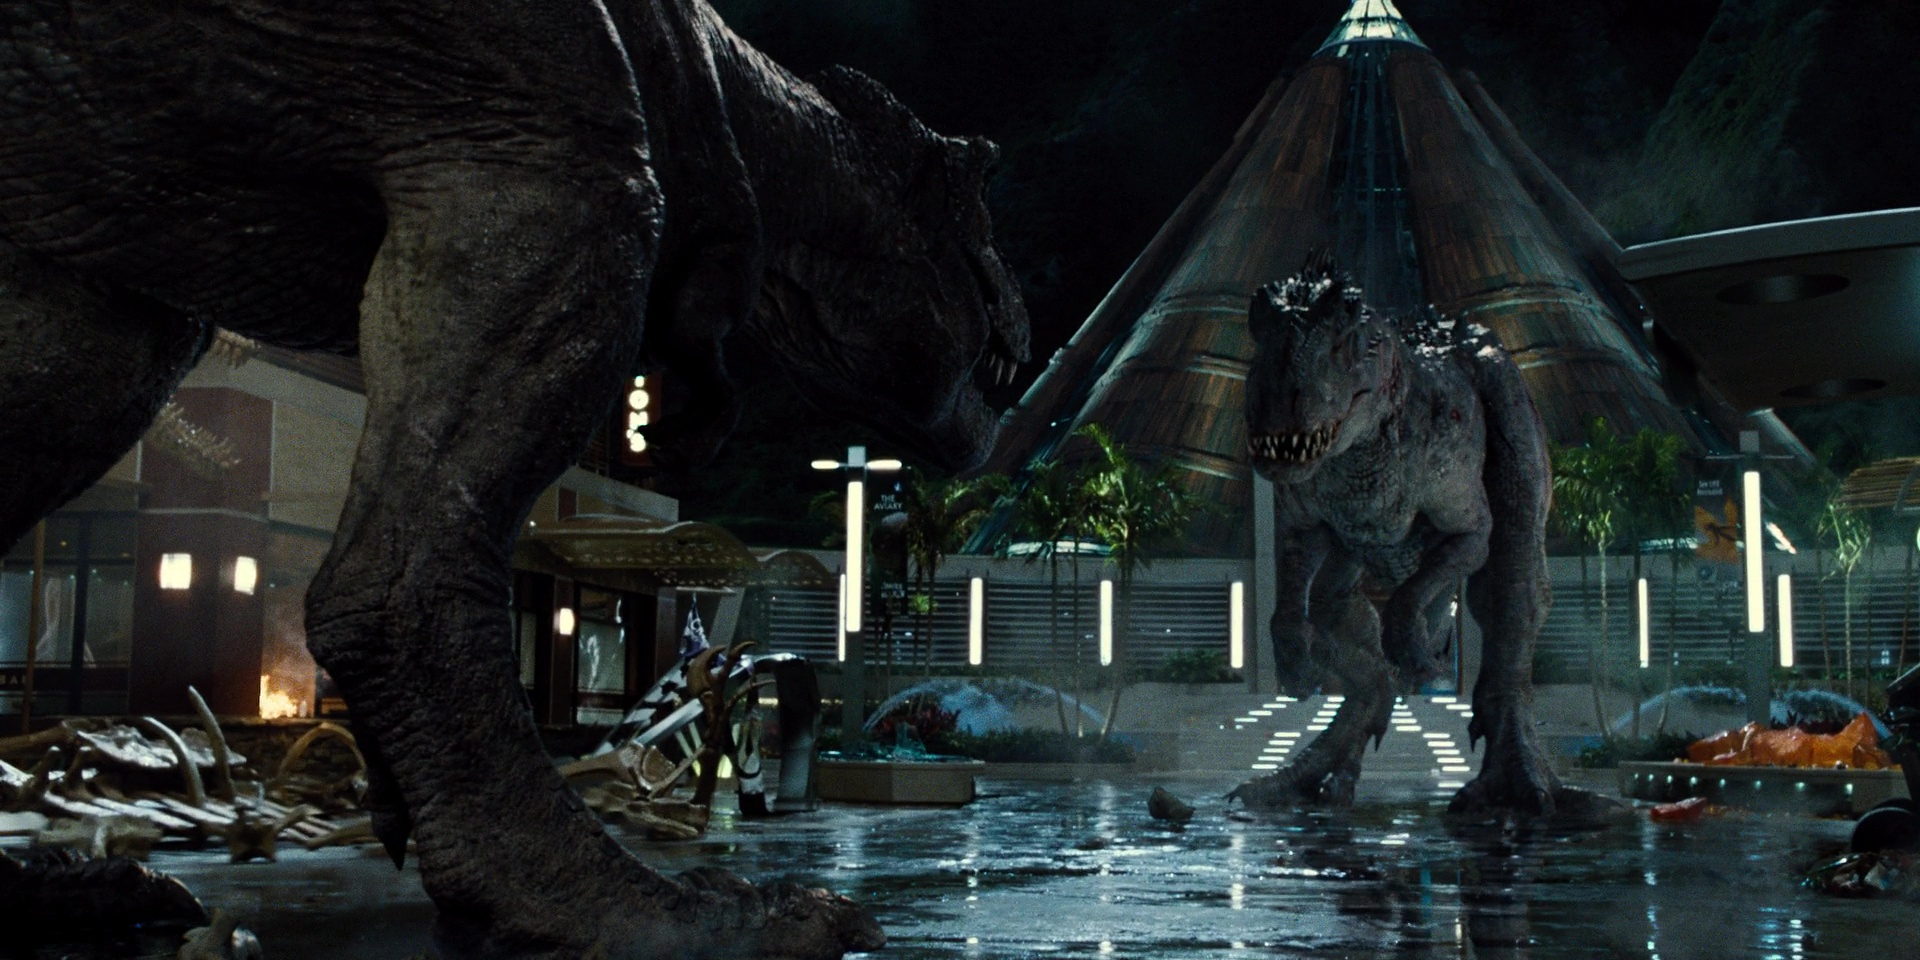 tyrannosaurus_rex_vs_indominus_rex.jpg